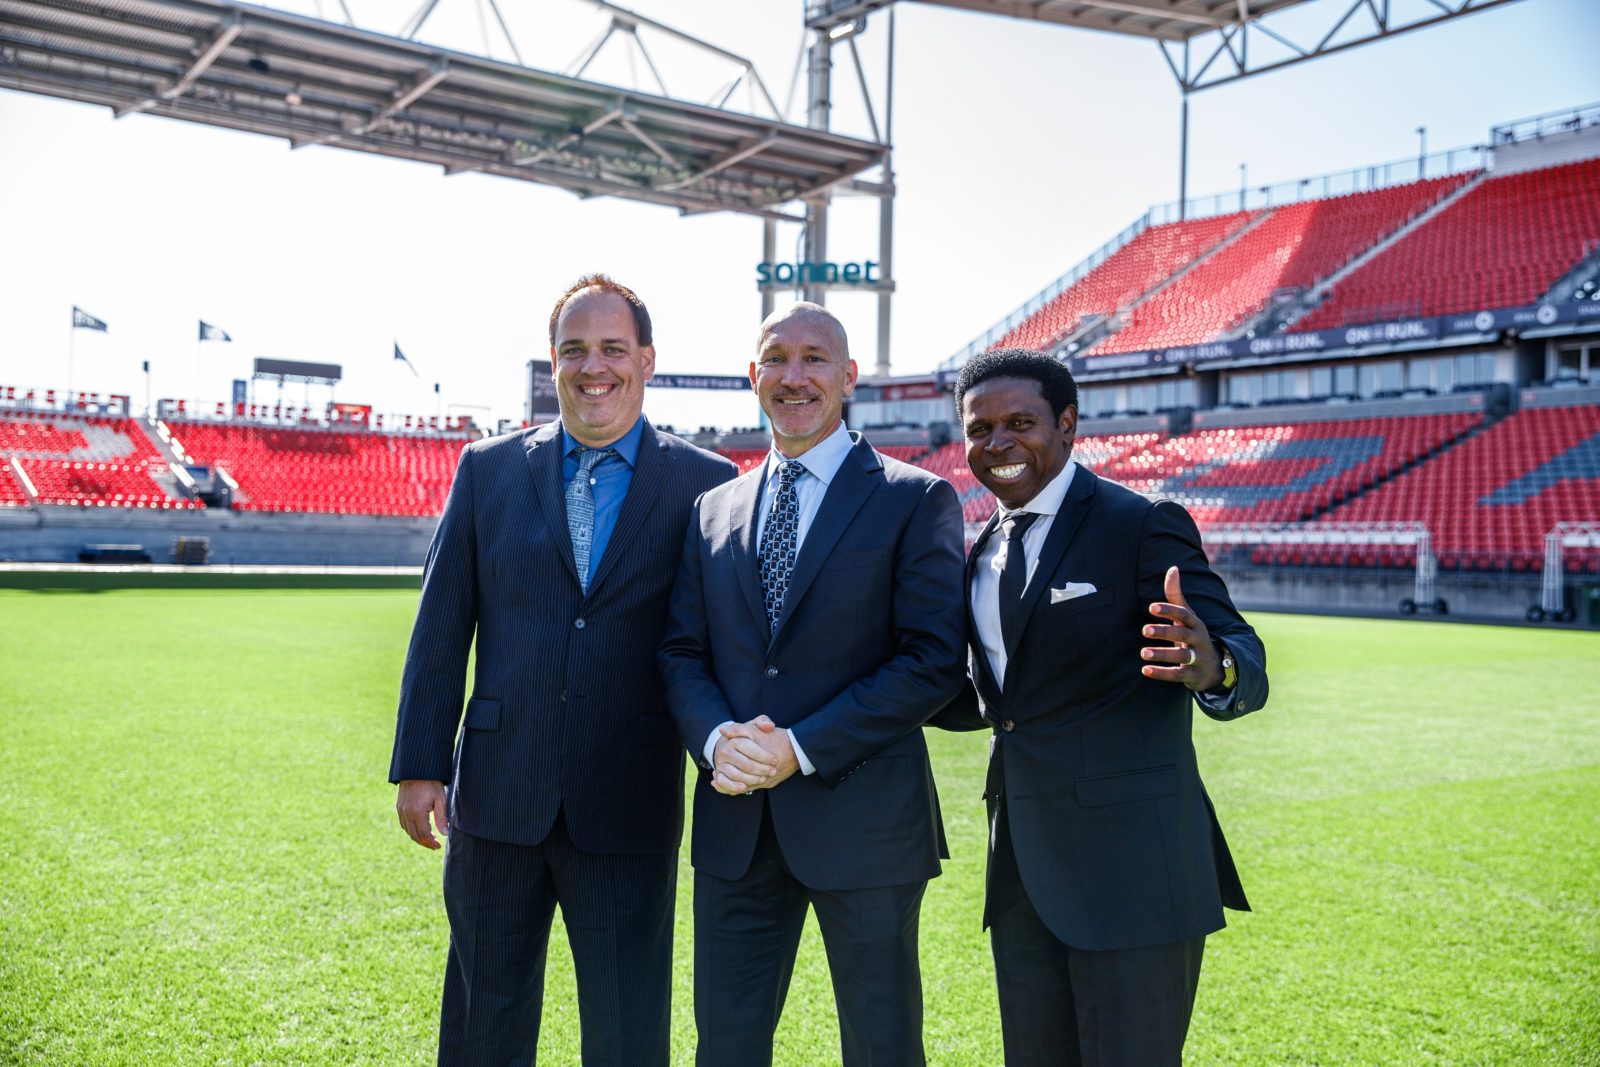 Hogan: Murphy ready for the challenge - Toronto Argonauts